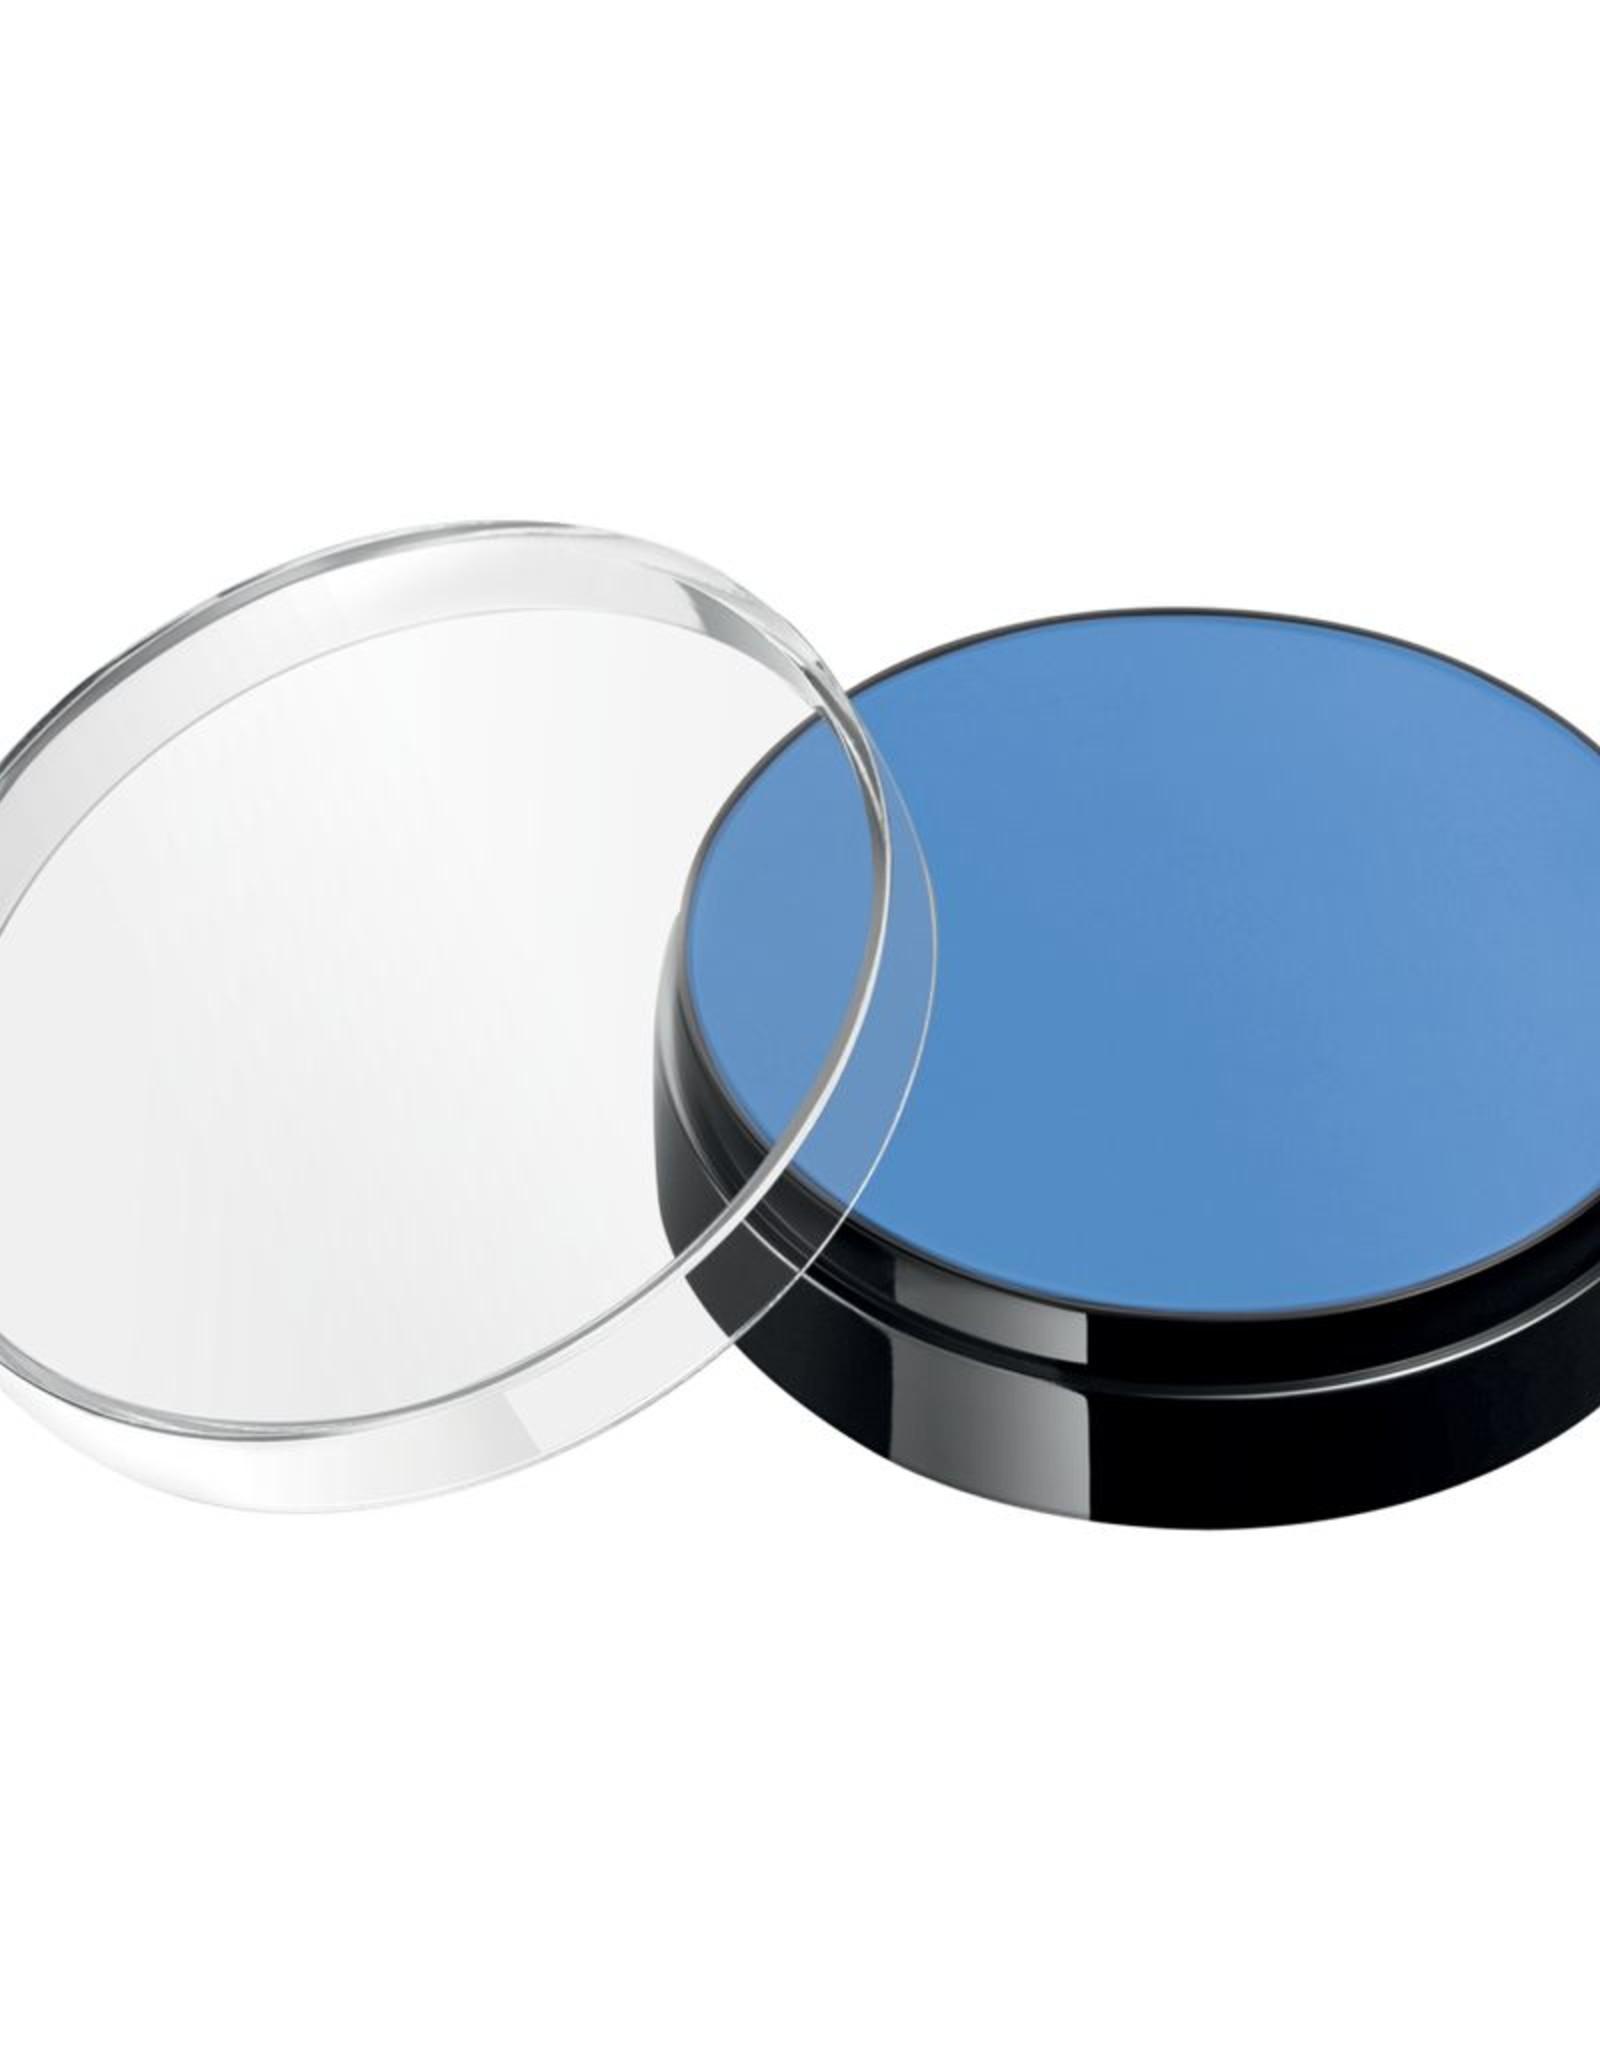 MUFE FARD A L'EAU 40g G82 bleu clair /  light blue